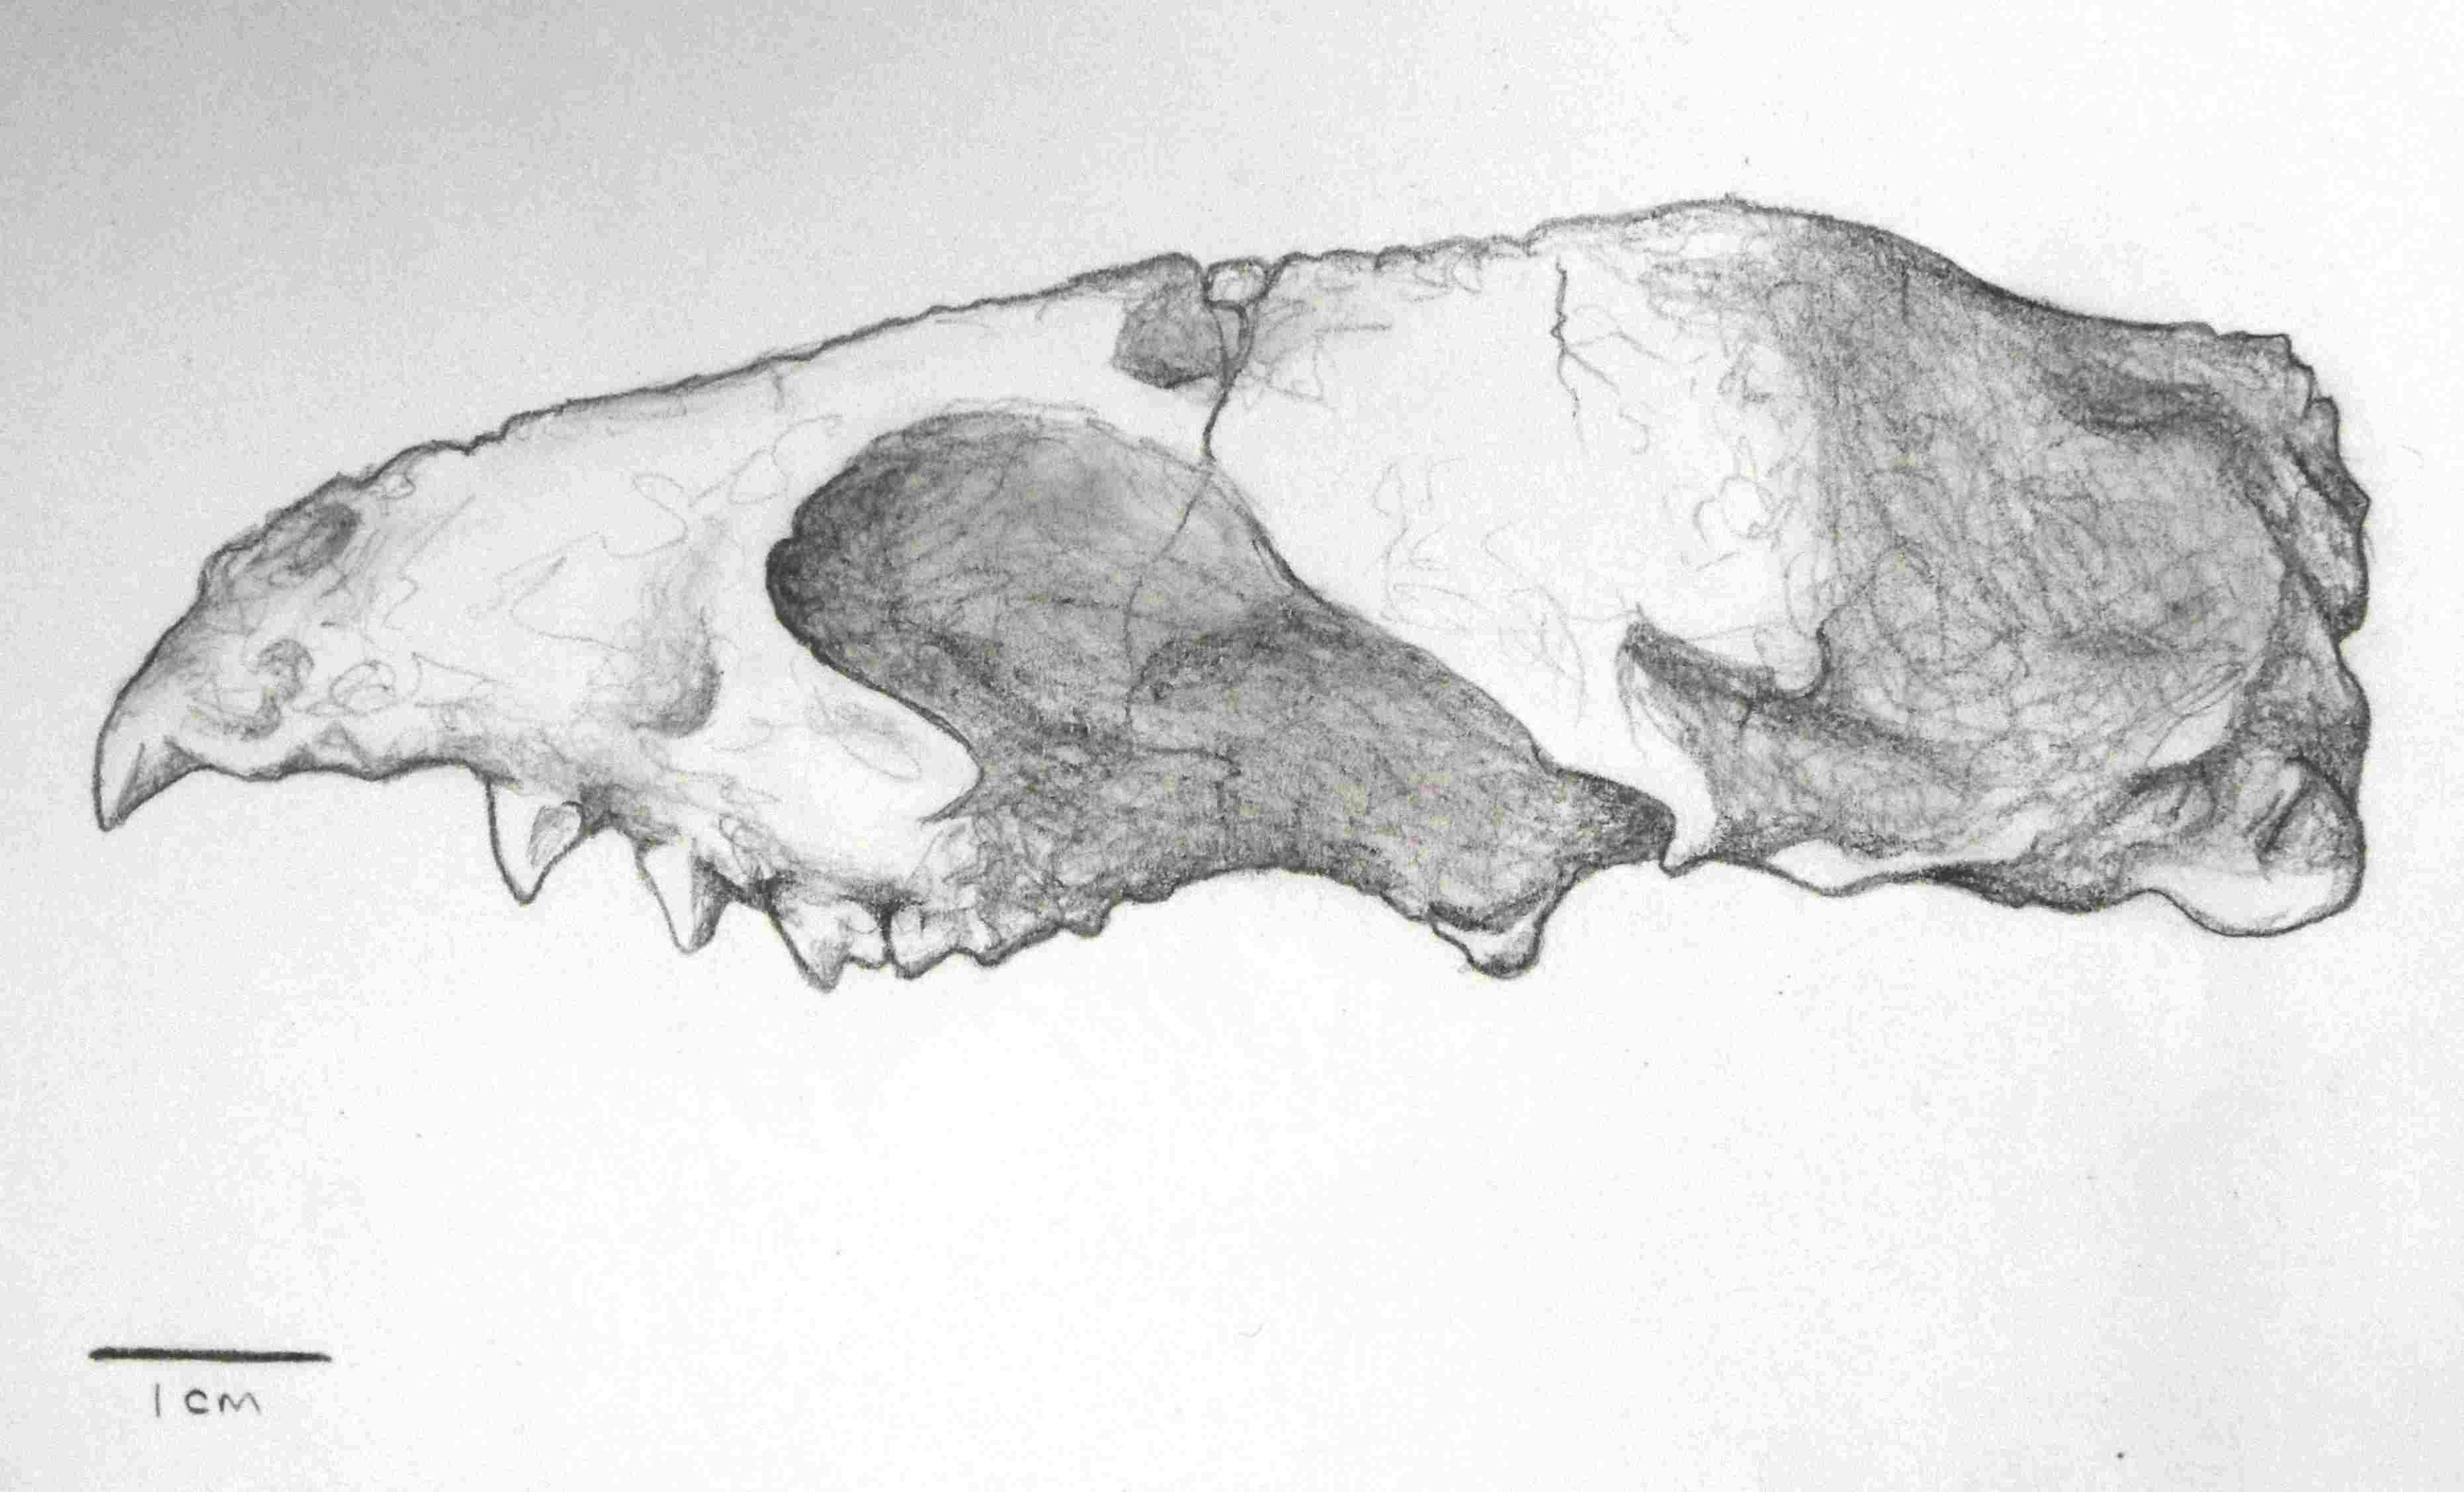 Illustration of a Miacis skull